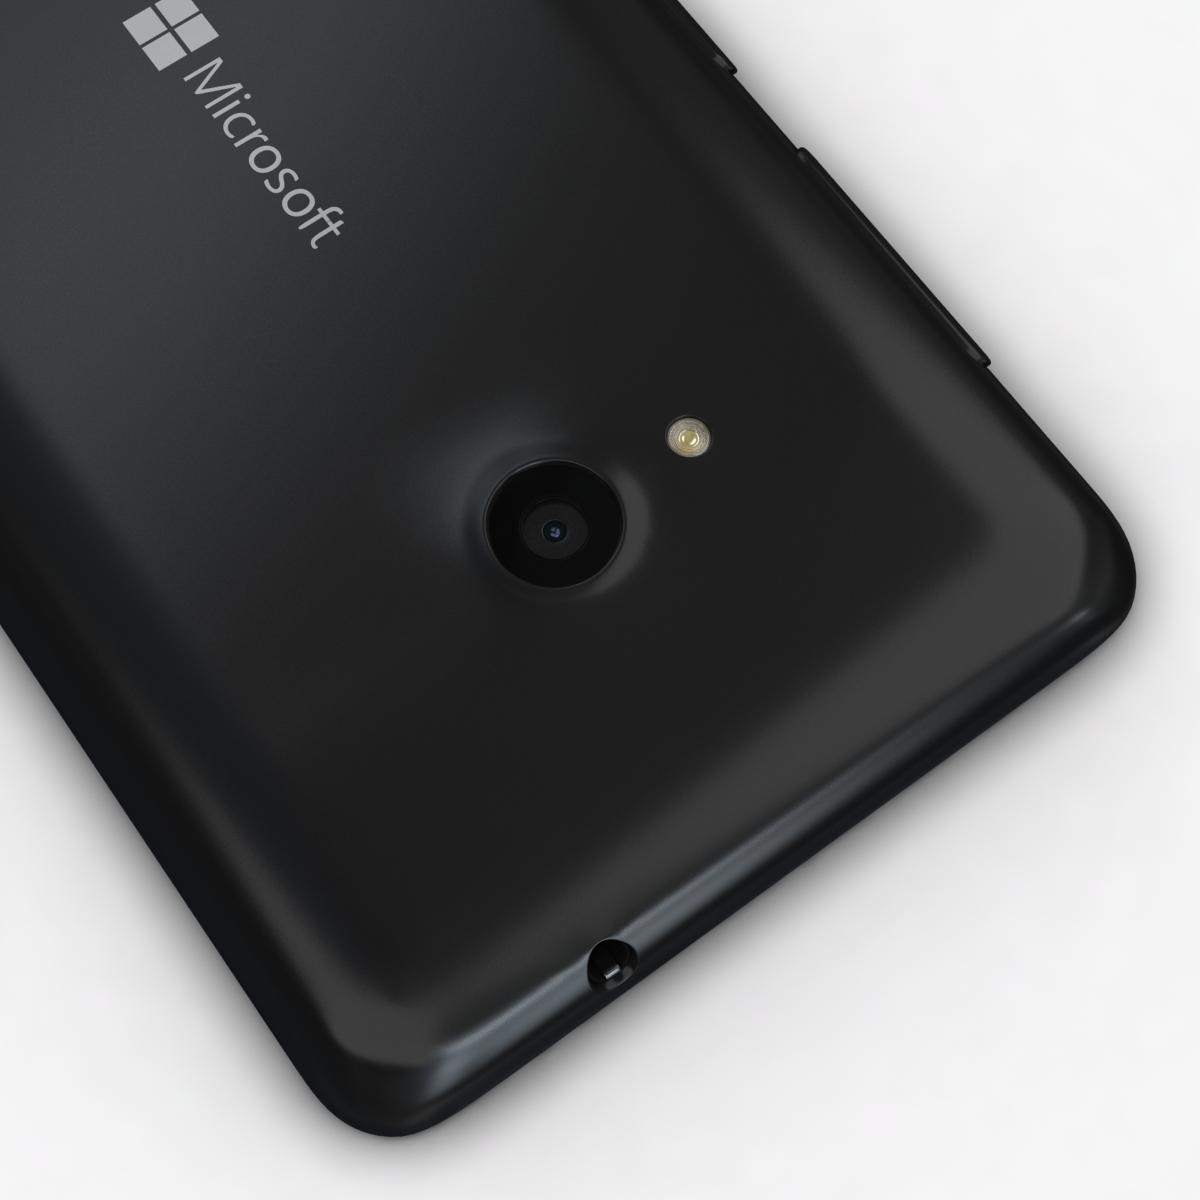 microsoft lumia 535 and dual sim black 3d model 3ds max fbx c4d obj 204357